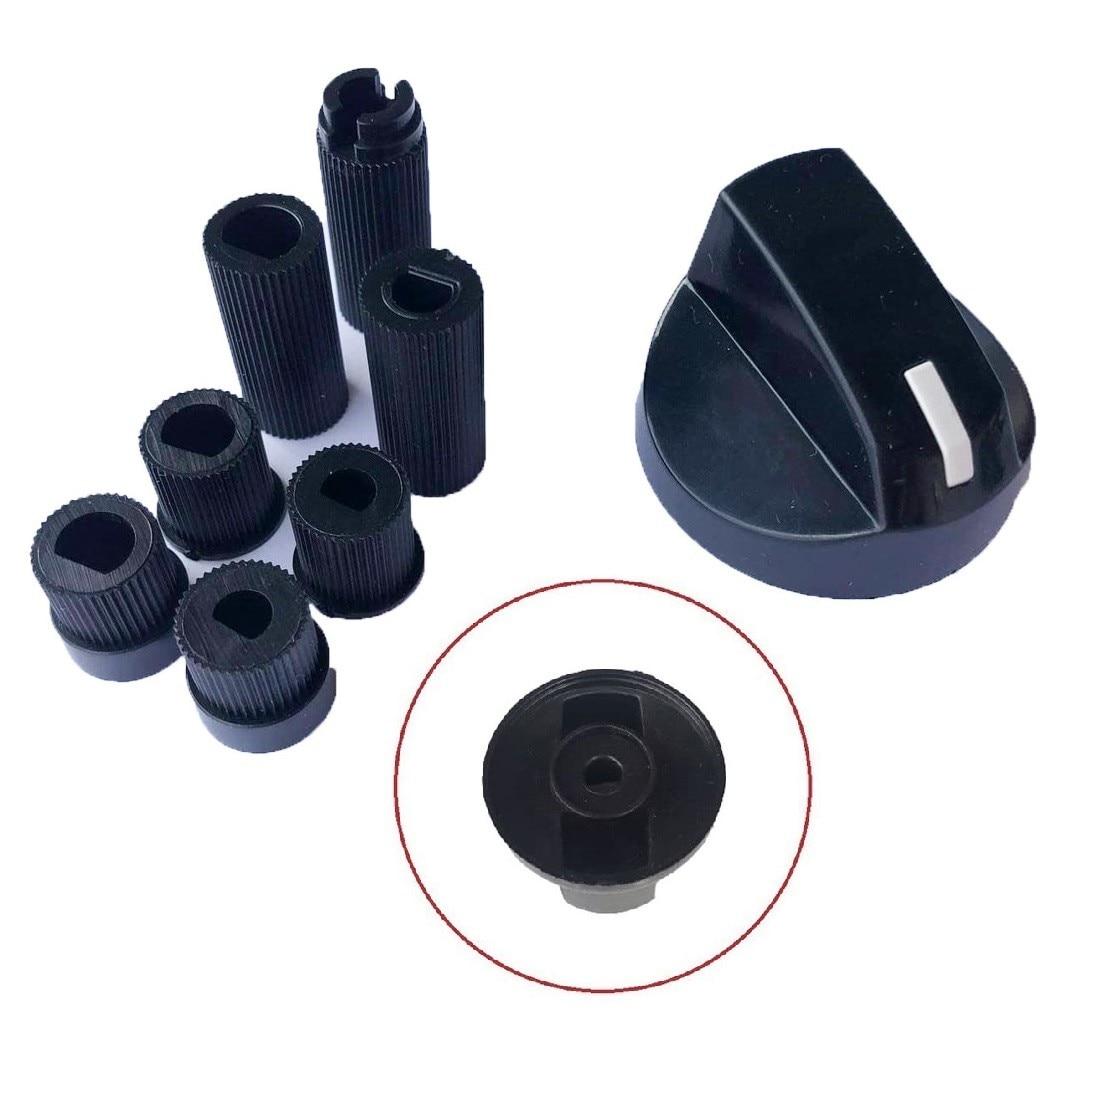 İtimat Oven Cooker Water Heater Cooktop Button 1 li Suit Black HT-SÜ0009-21